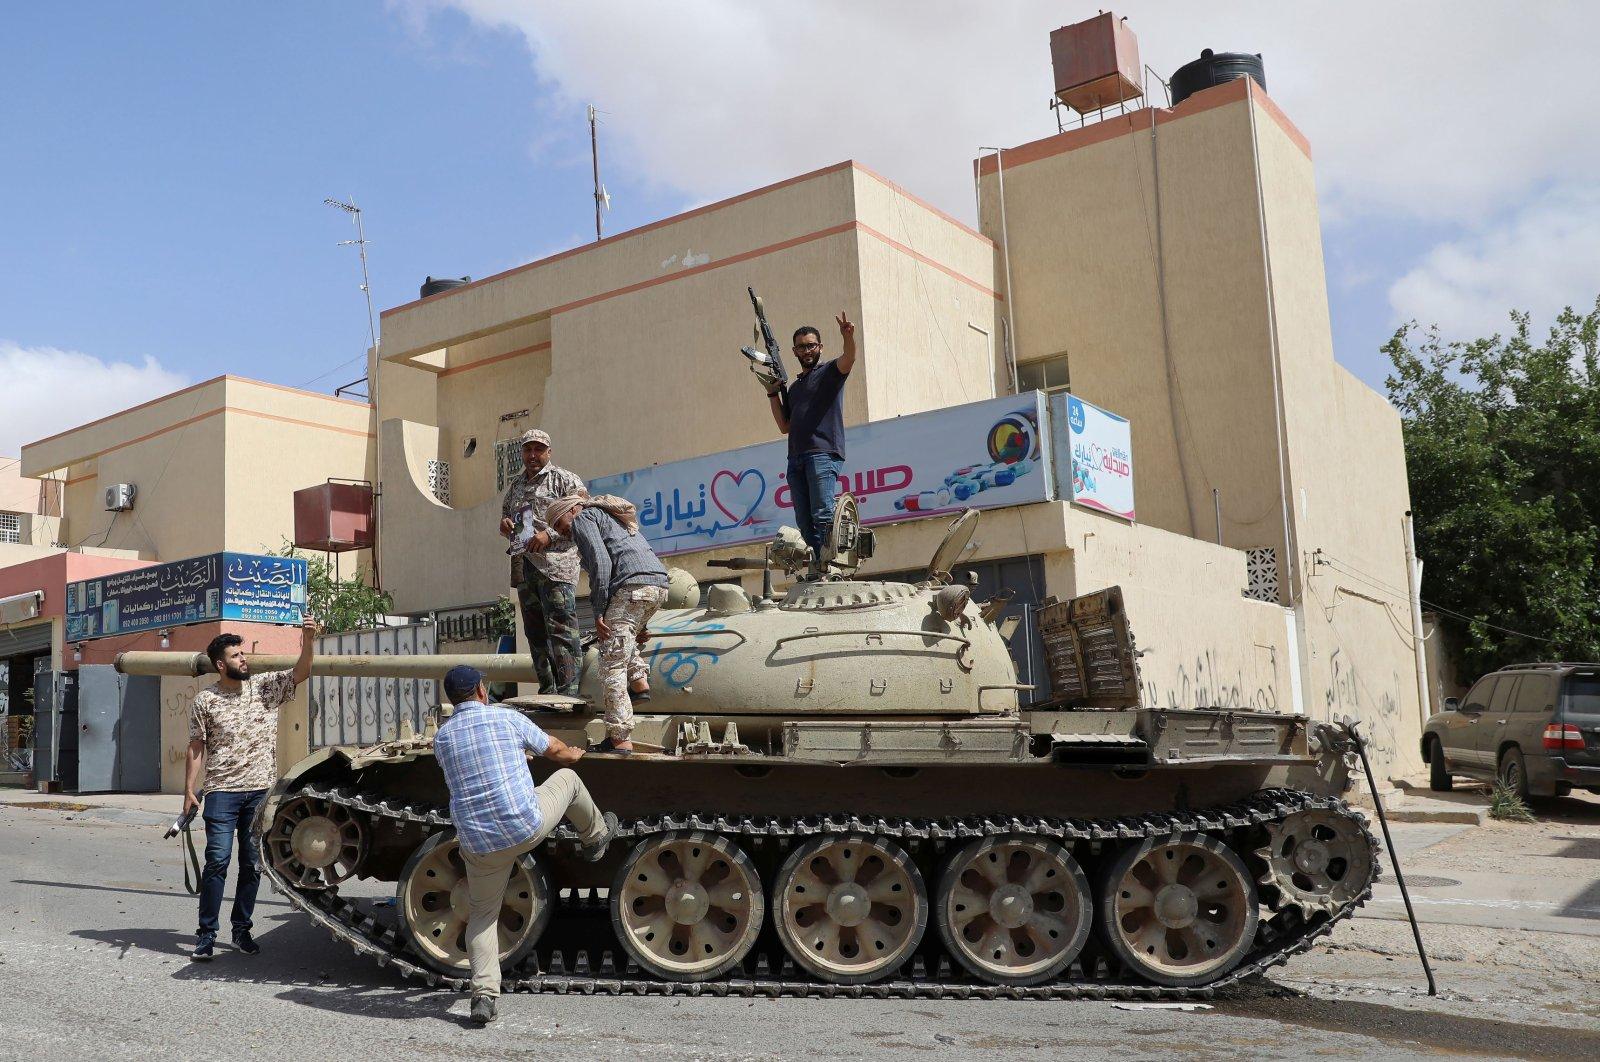 Fighters loyal to Libya's internationally recognized government celebrate after regaining control over Tarhuna city, Libya, June 5, 2020. (Reuters Photo)